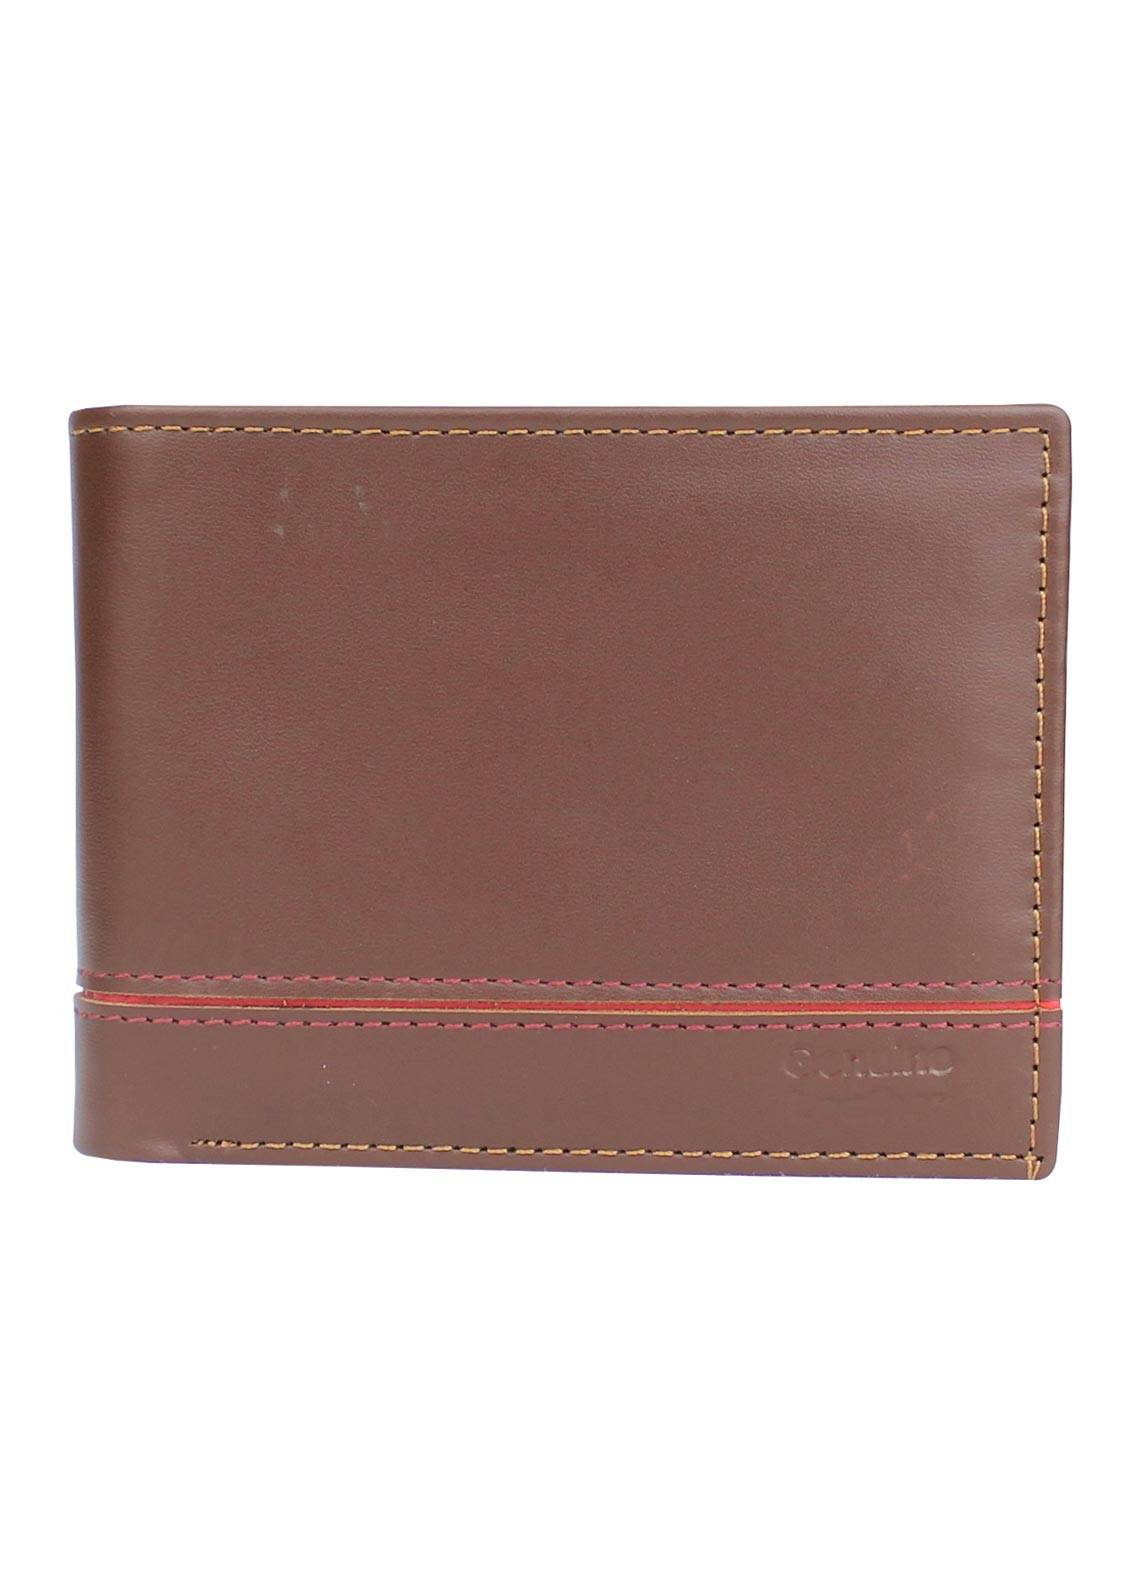 Shahzeb Saeed Plain Texture Leather  Wallet W-063 - Men's Accessories